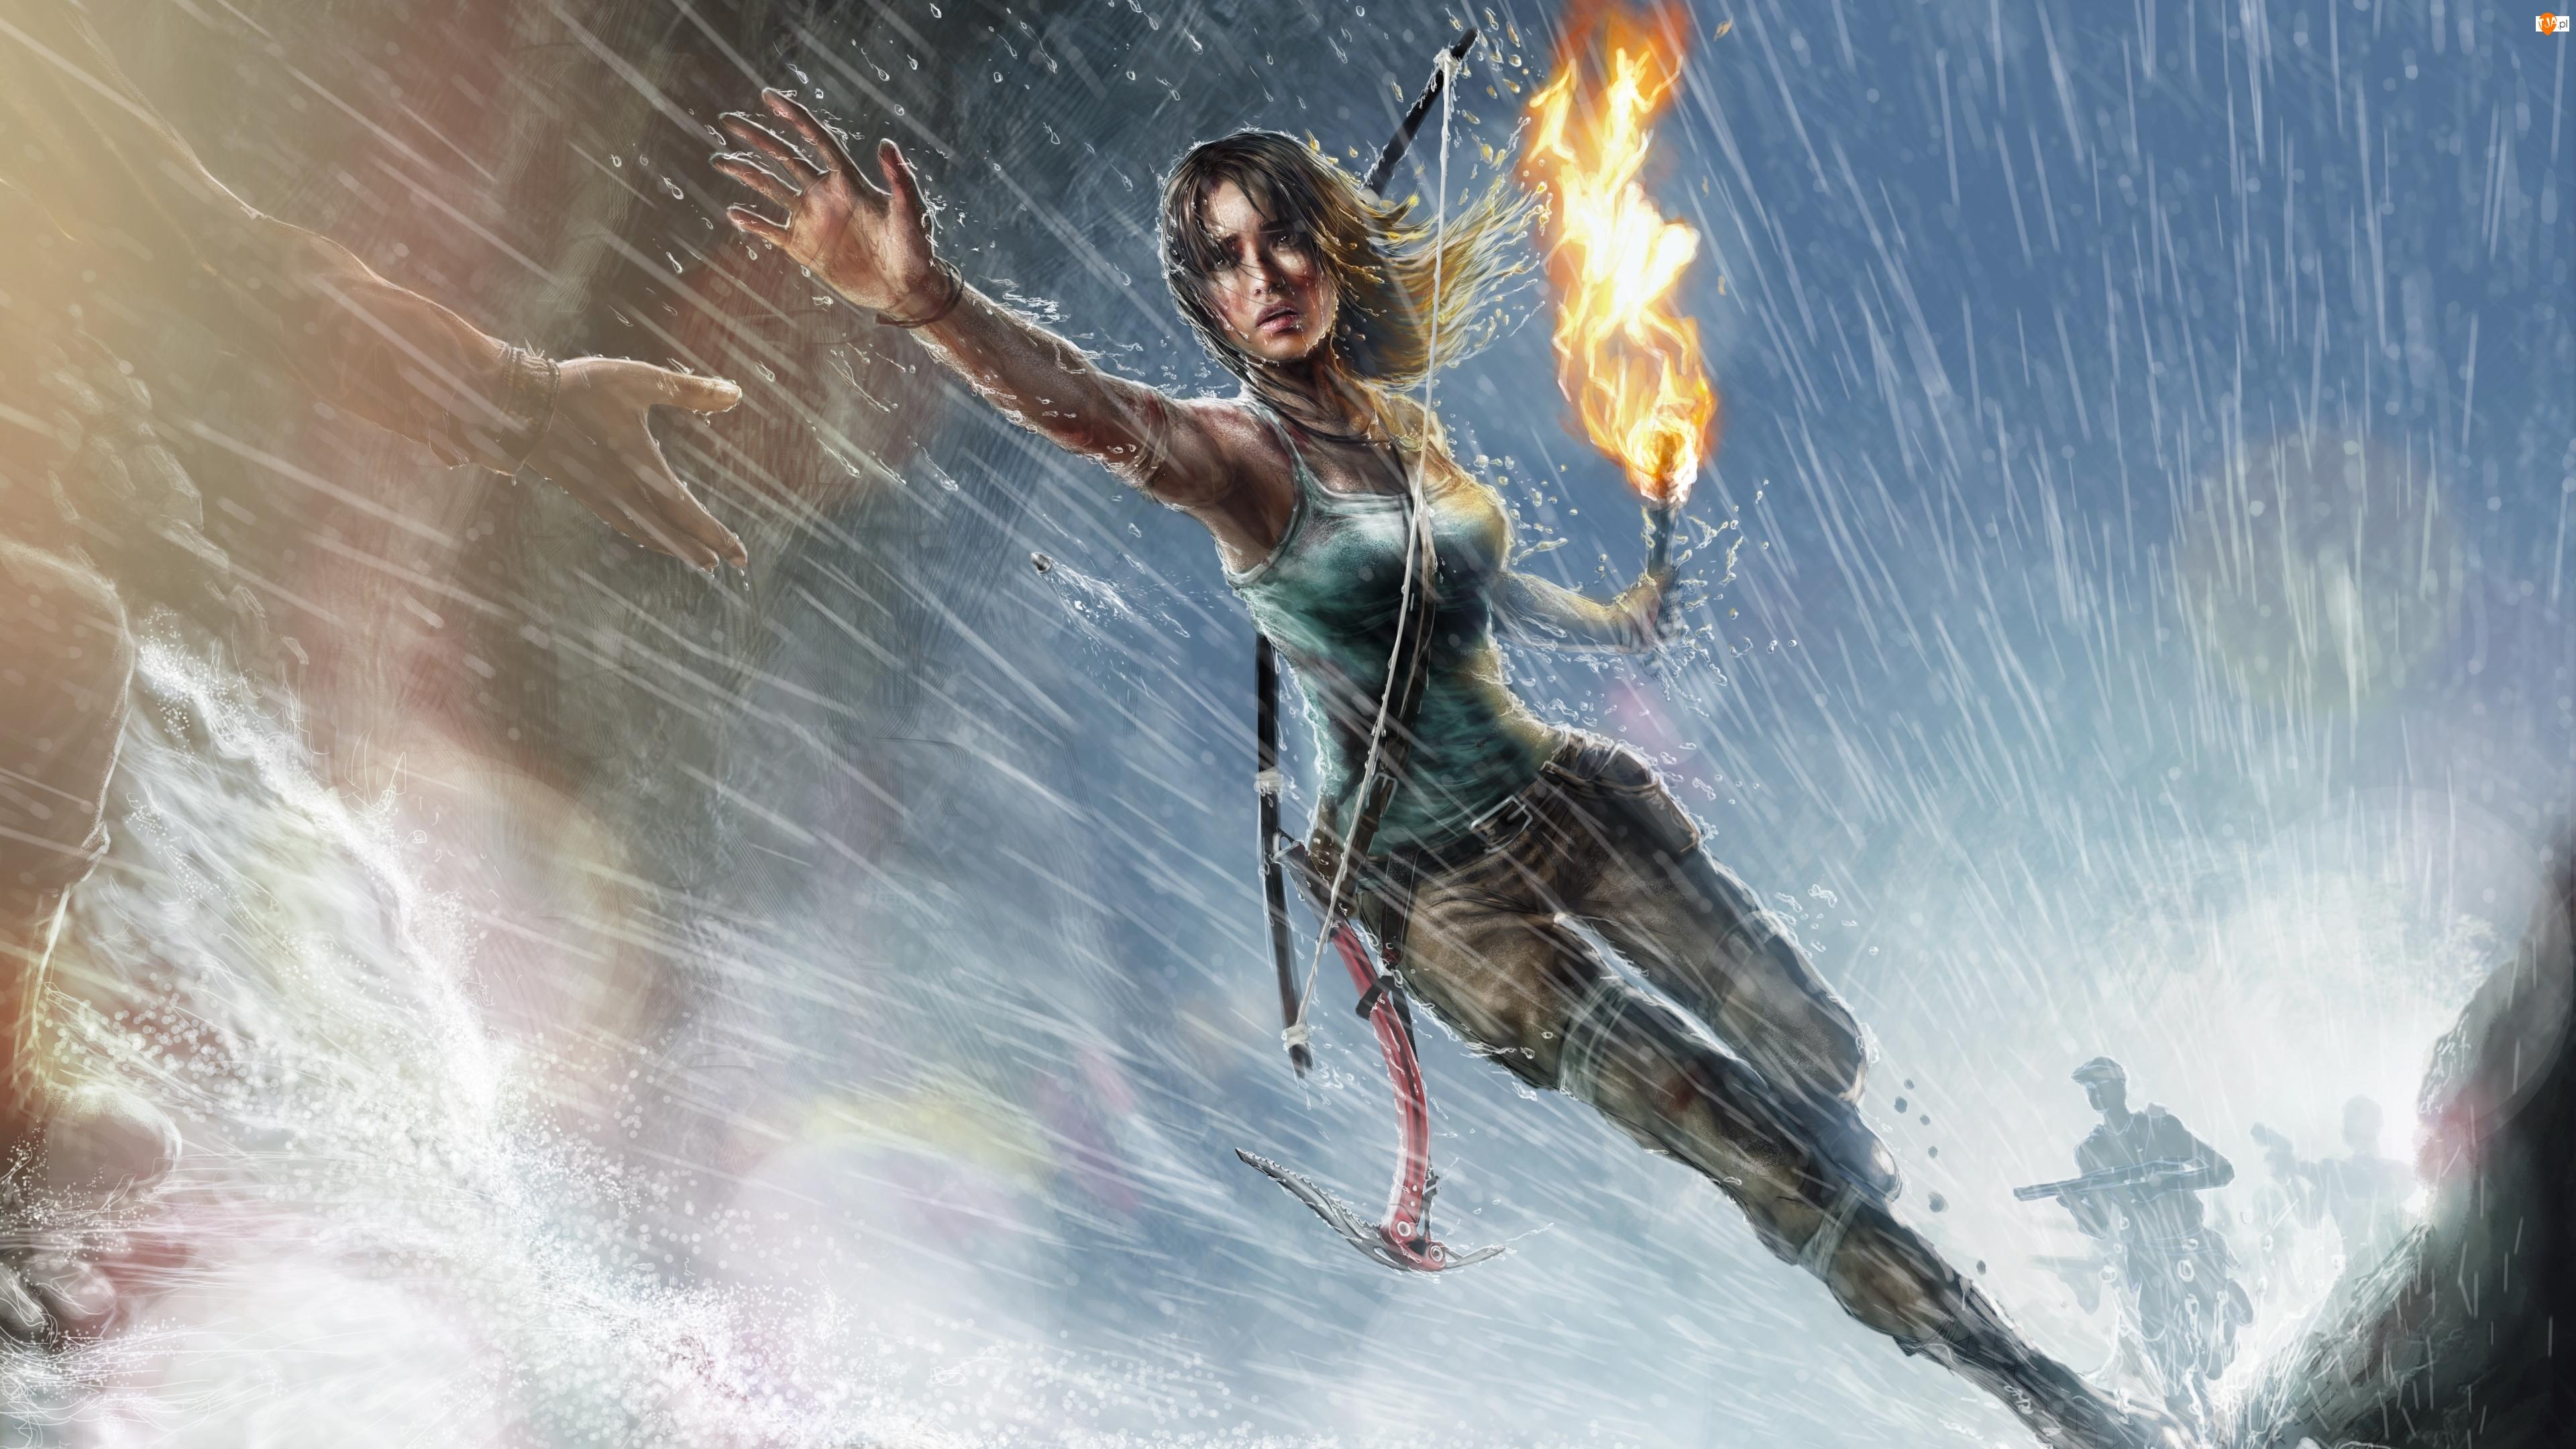 Lara Croft, Pochodnia, Gra, Łuk, Rise of the Tomb Raider, Ręka